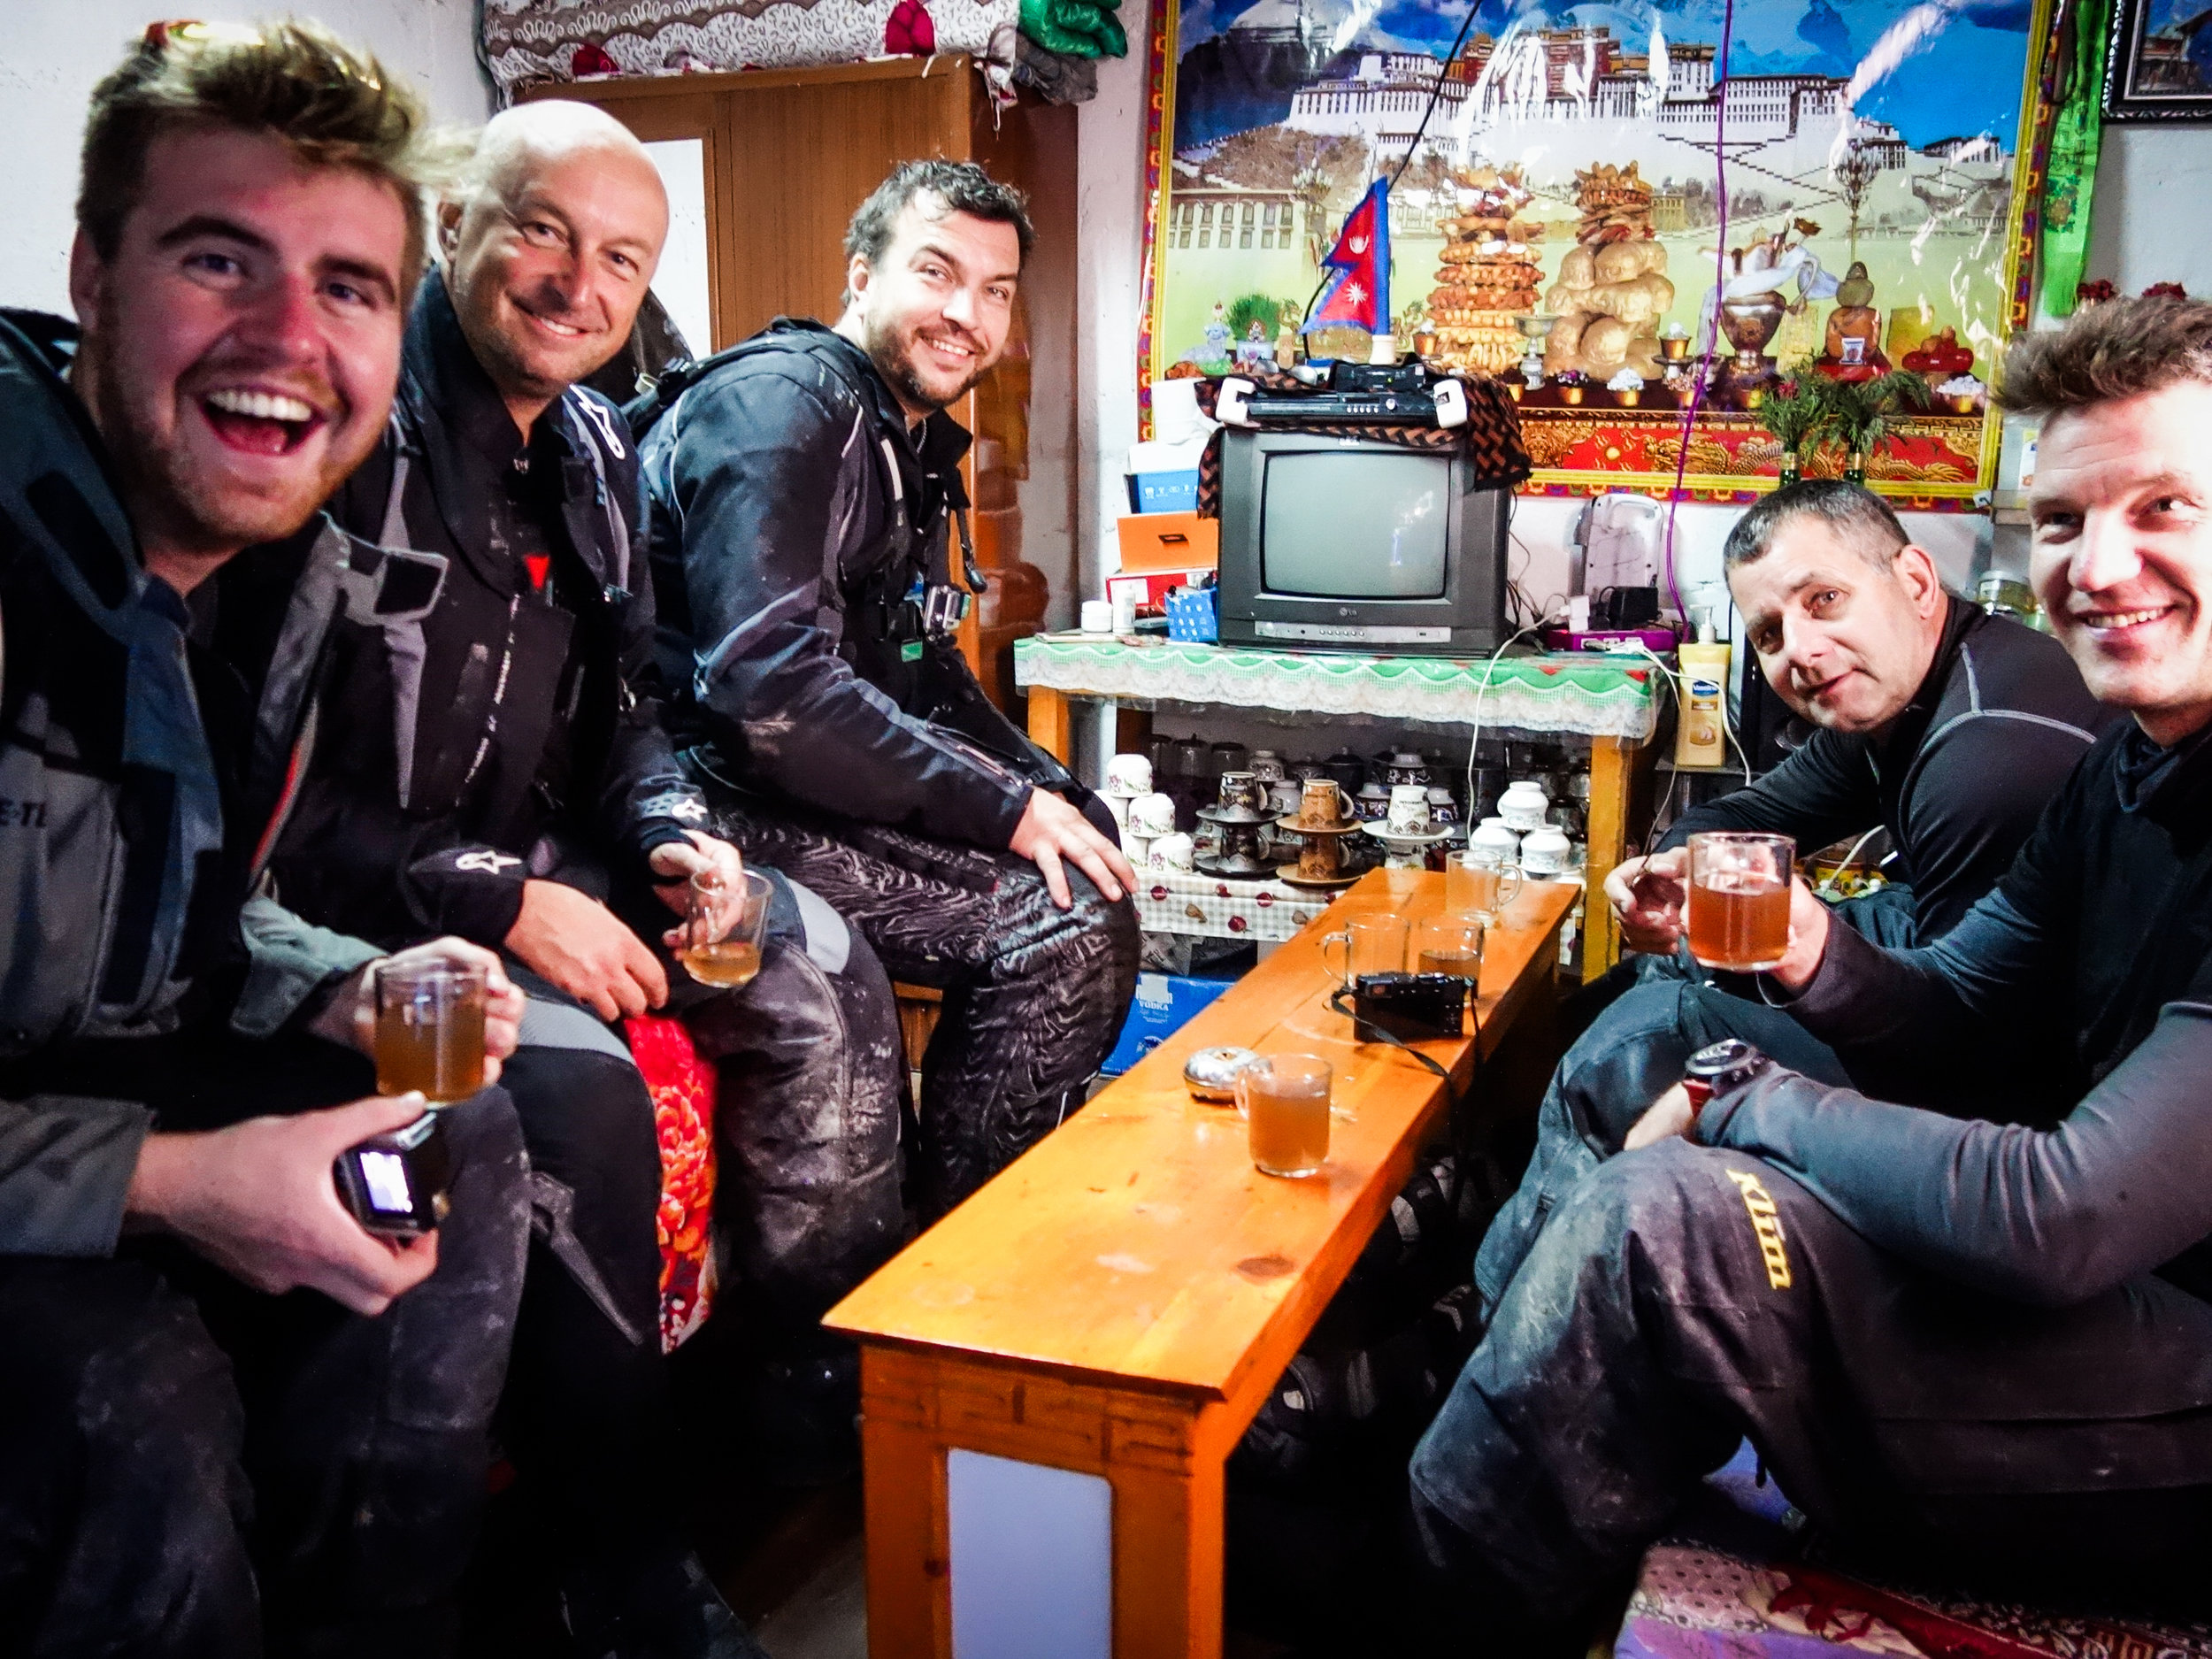 TWHMC-nepal-motorcycle-adventure-2016-03883-2.jpg